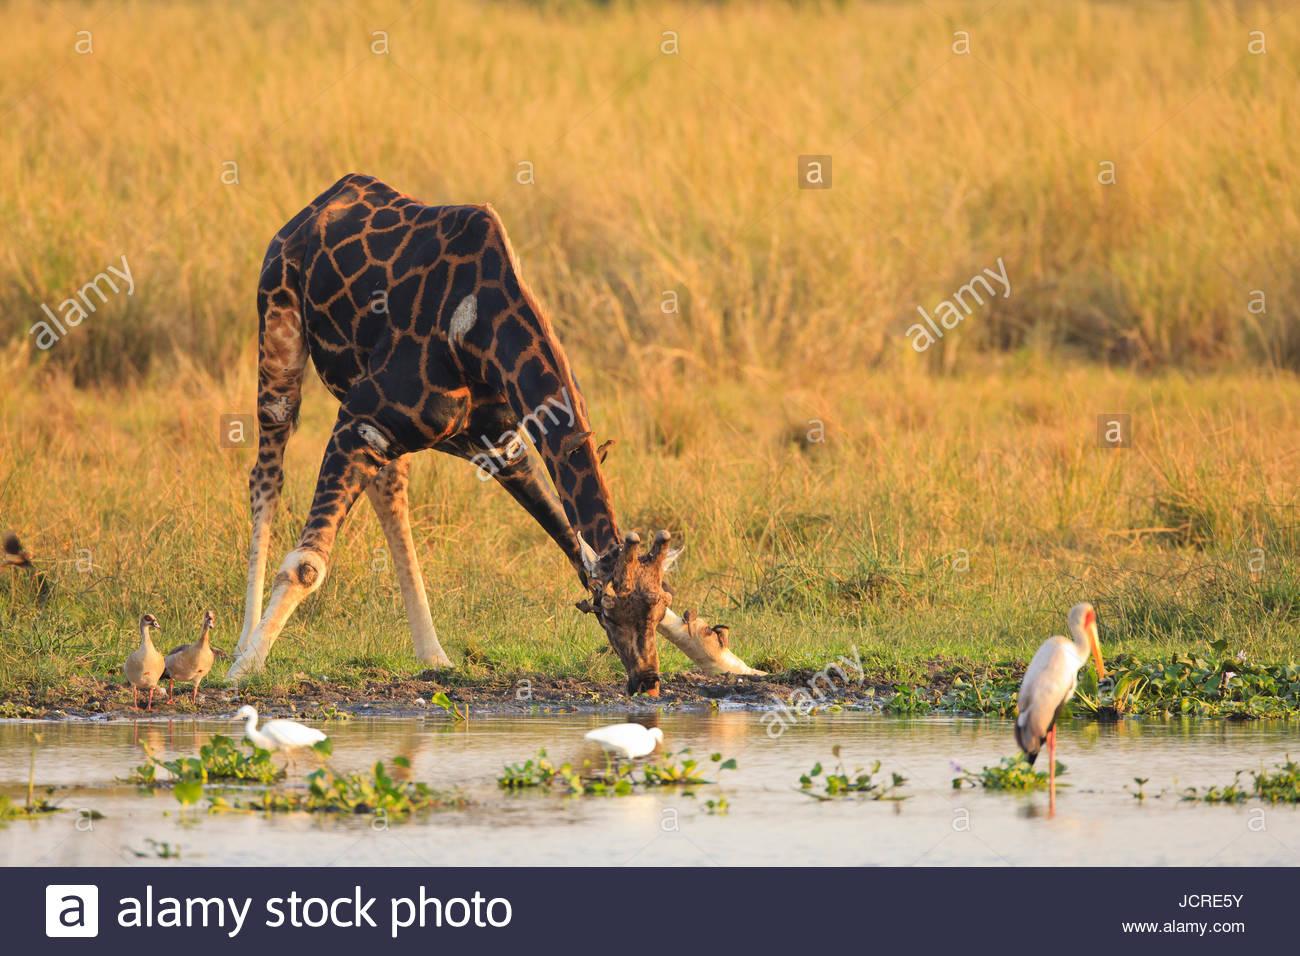 A Rothschild's giraffe, Giraffa camelopardalis rothschildi, drinking surrounded by water birds. - Stock Image